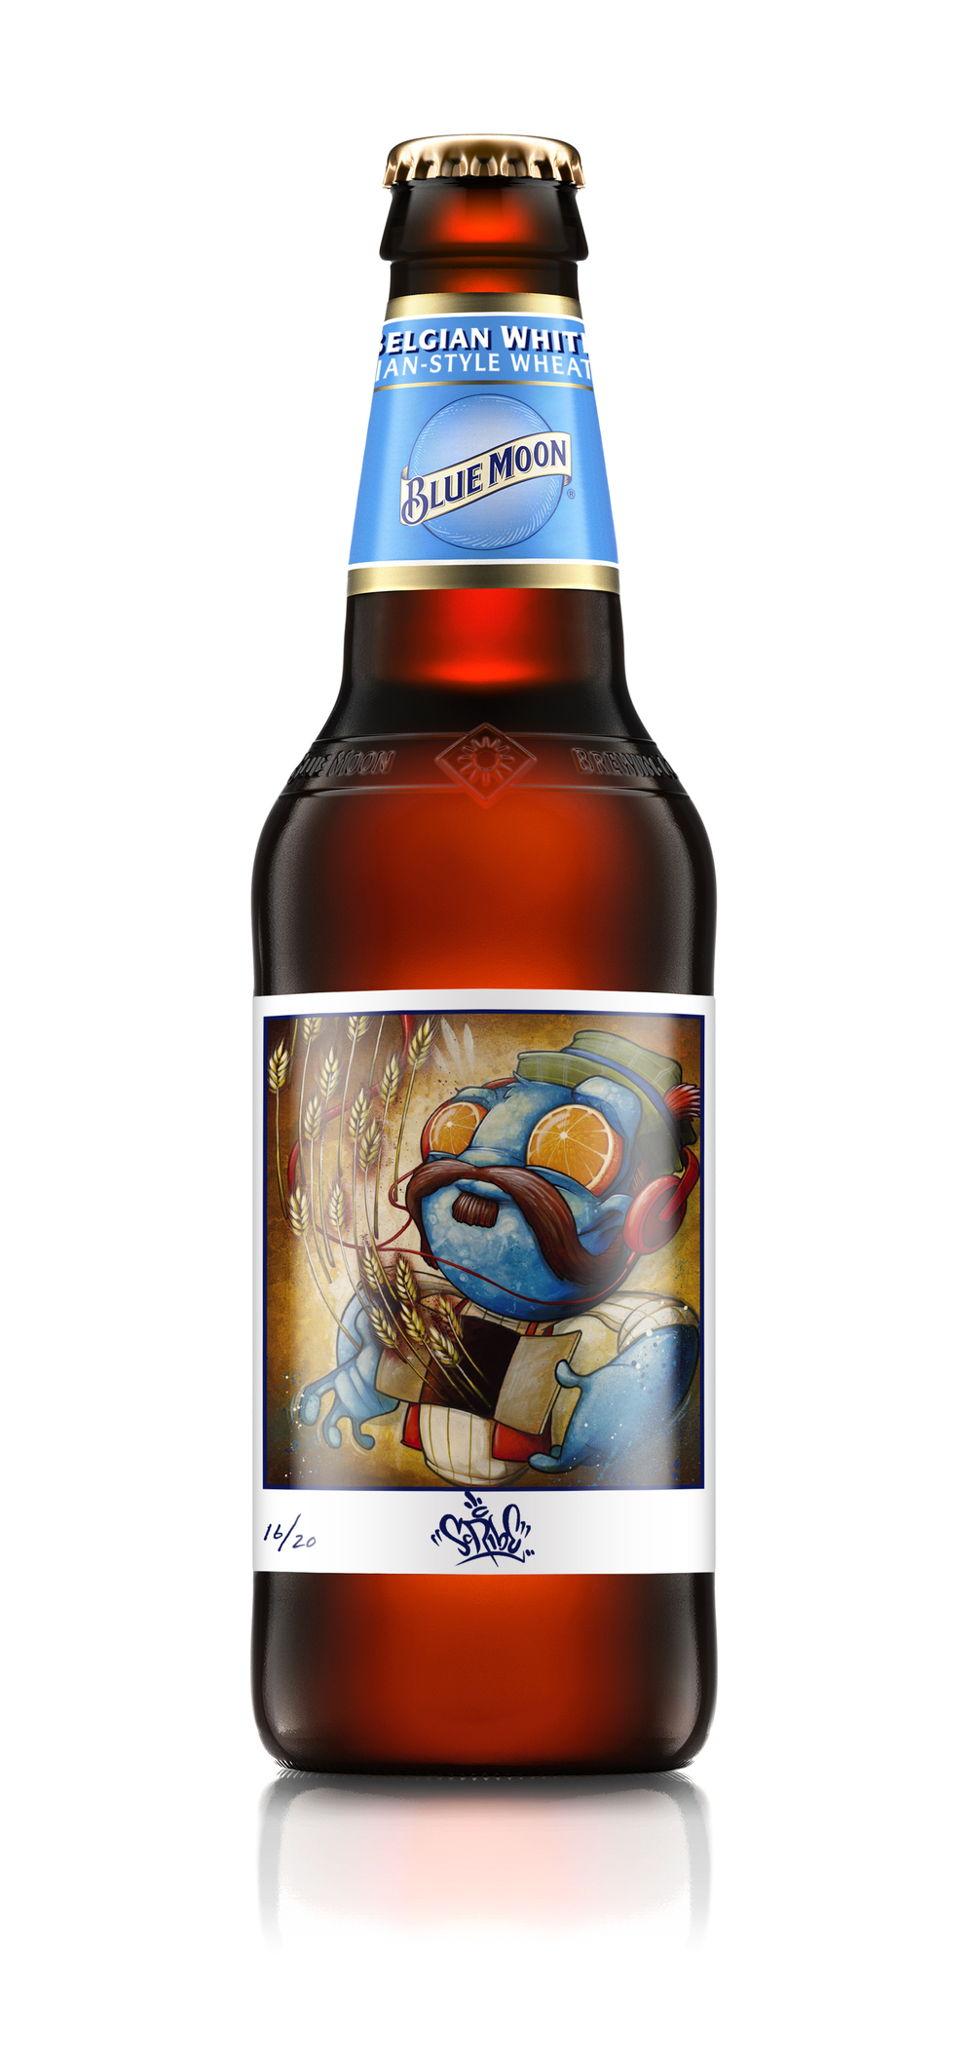 BMO-195A_Bottle_12z_Render_DonaldRossScribe_150401_FJ.jpg